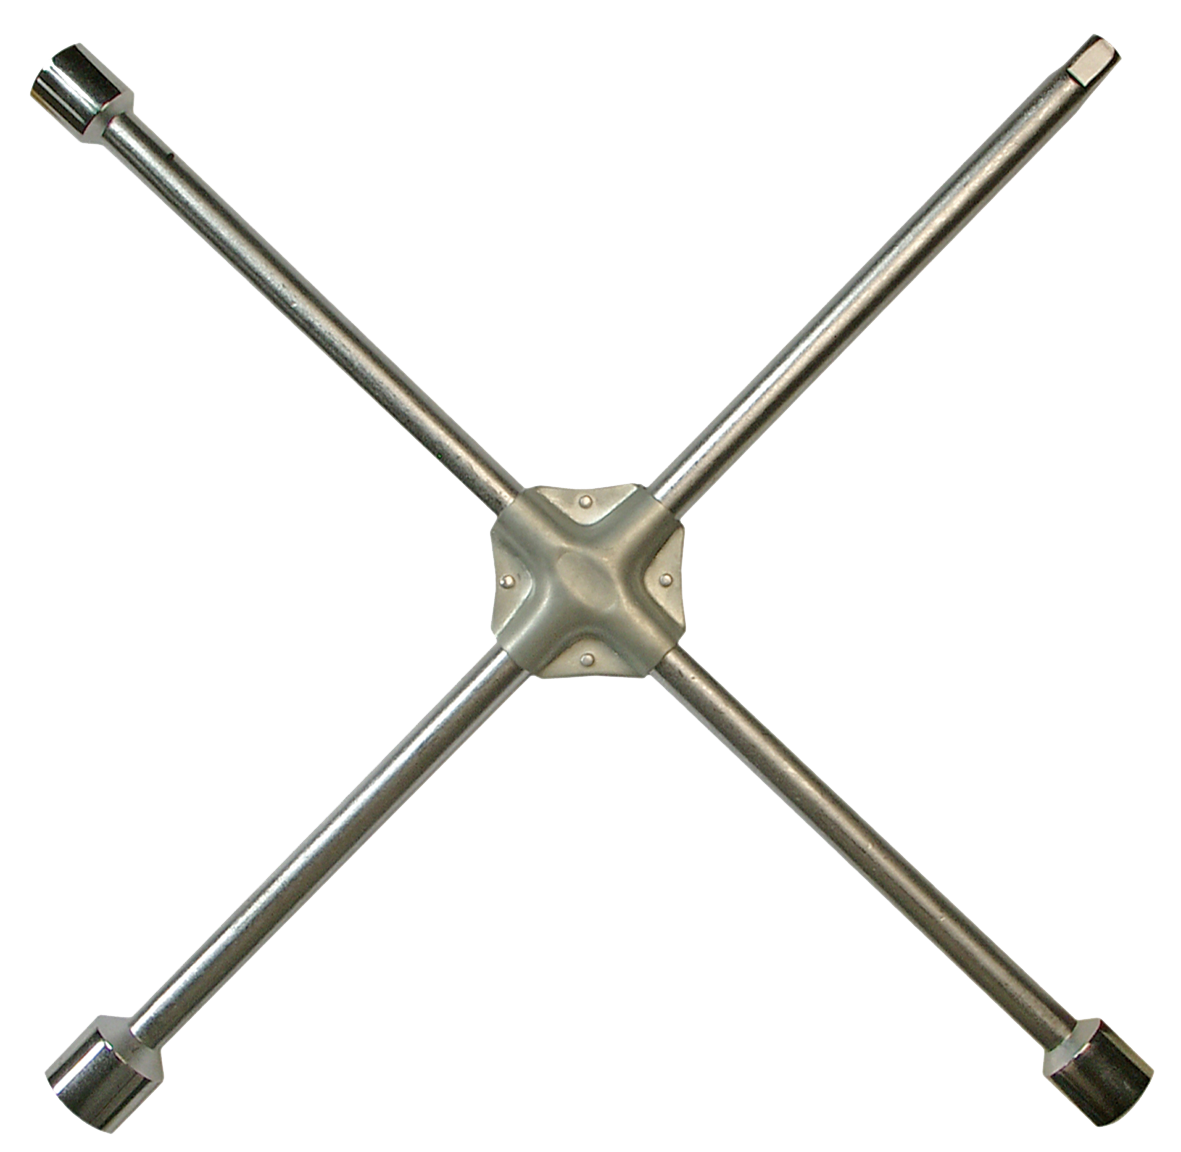 SWSTAHL Radkreuzschlüssel, 17 x 19 x 21 x 1/2 Zoll 02100L